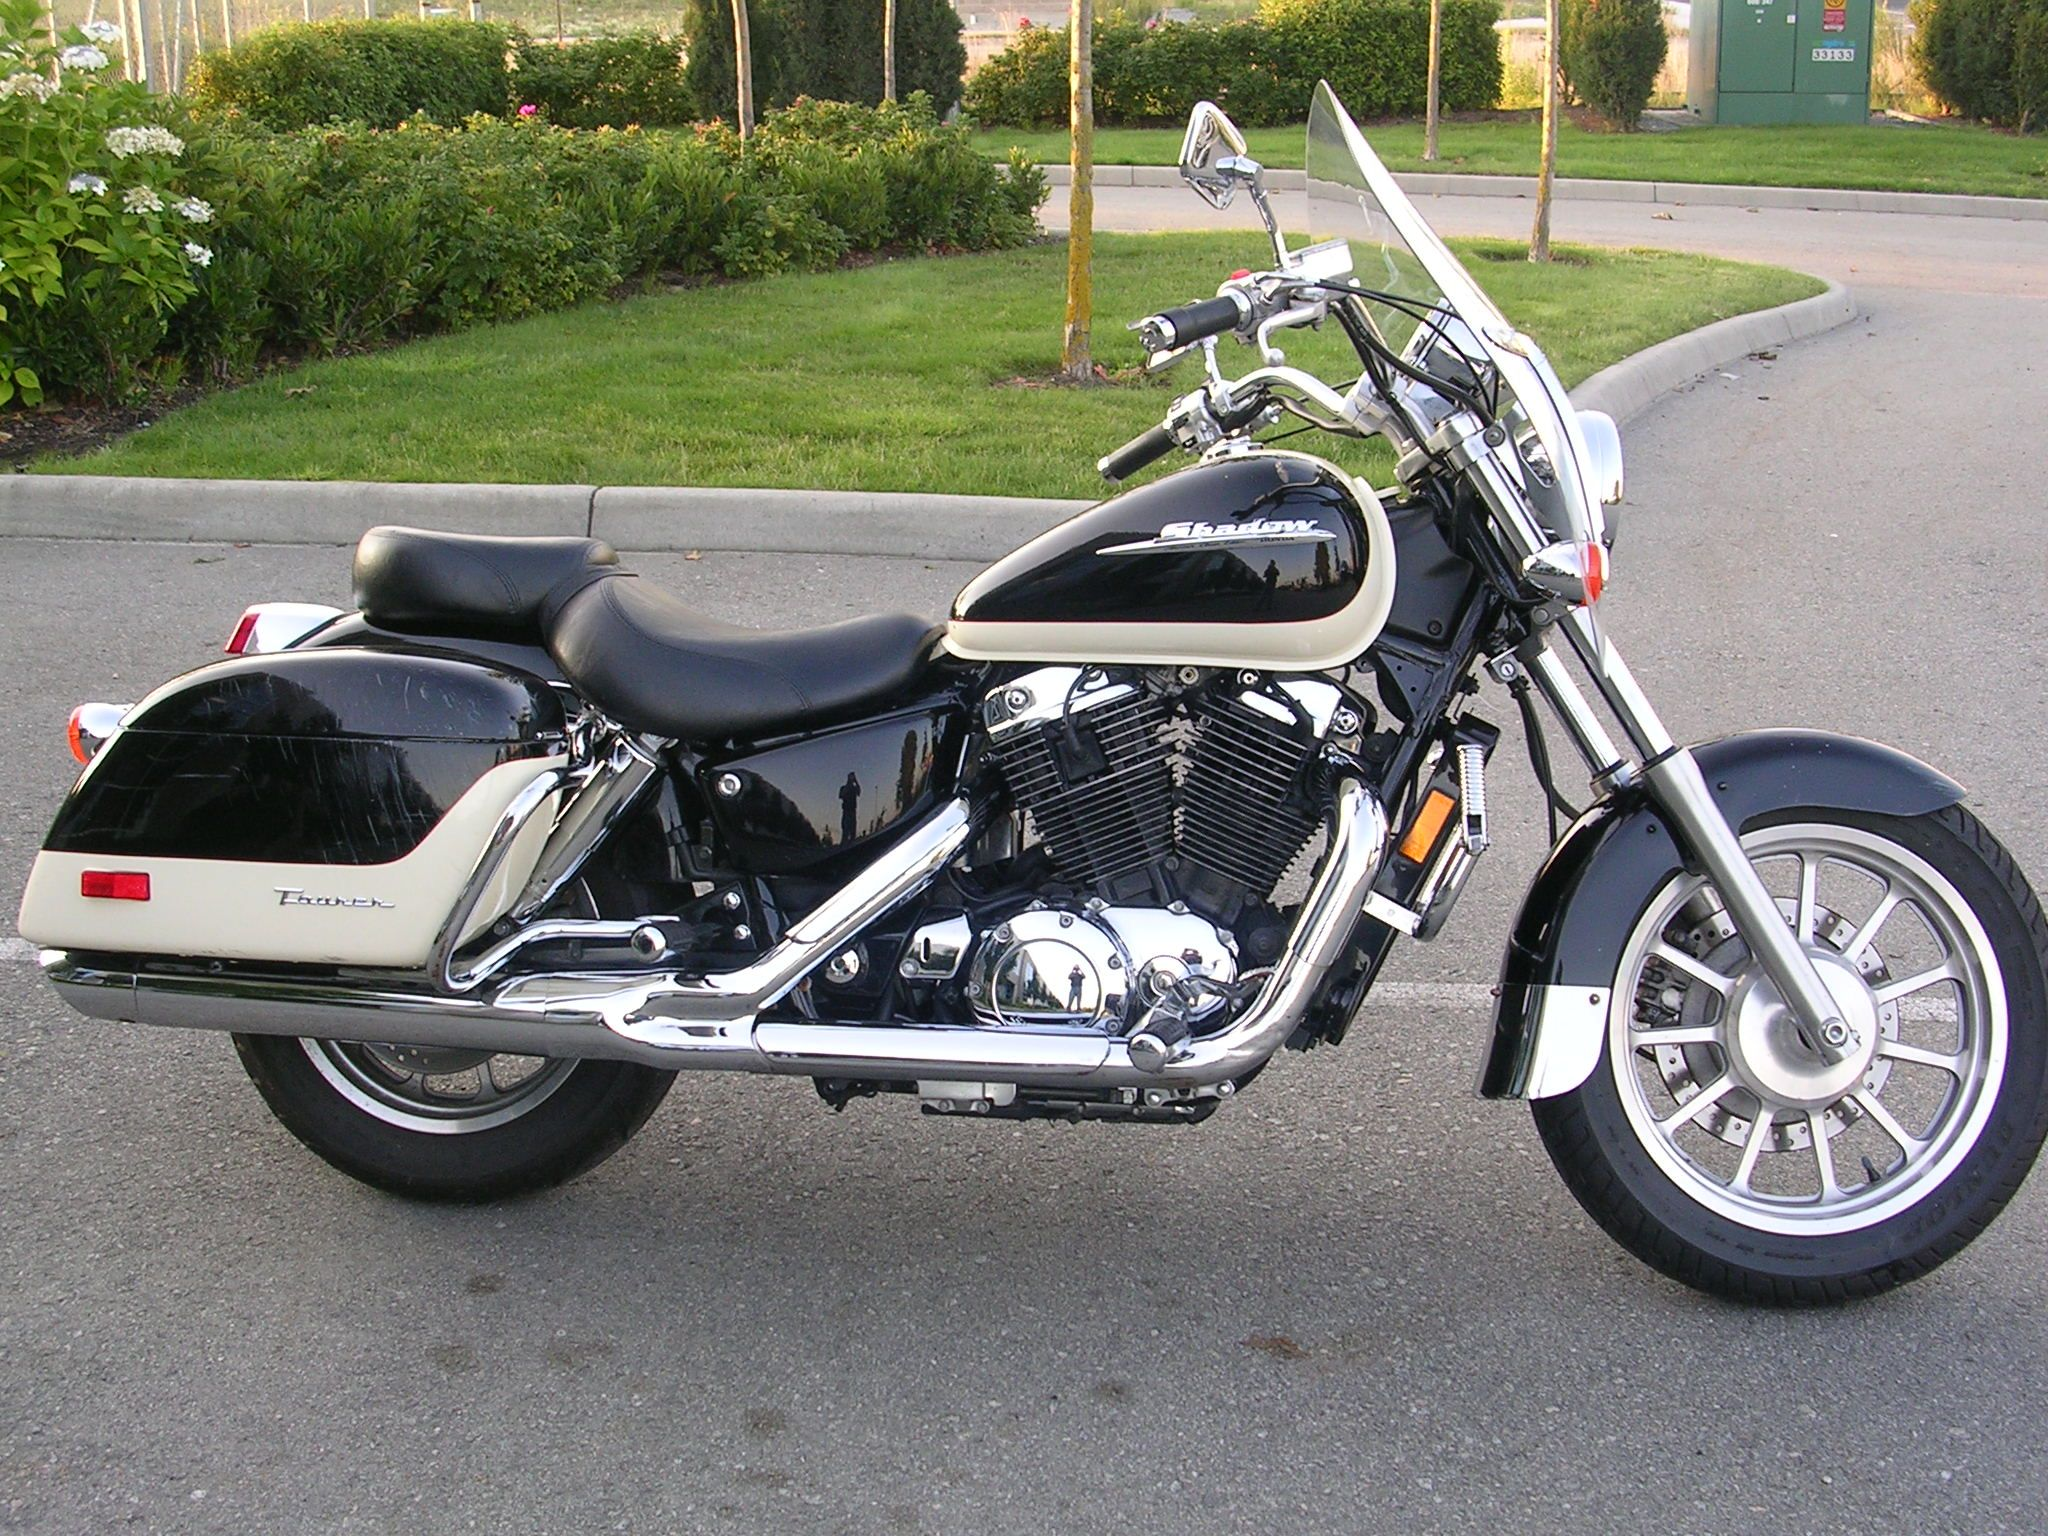 honda shadow 1100 touring edition the honda shadow a merican c lassic e dition tourer model vt1100t [ 2048 x 1536 Pixel ]